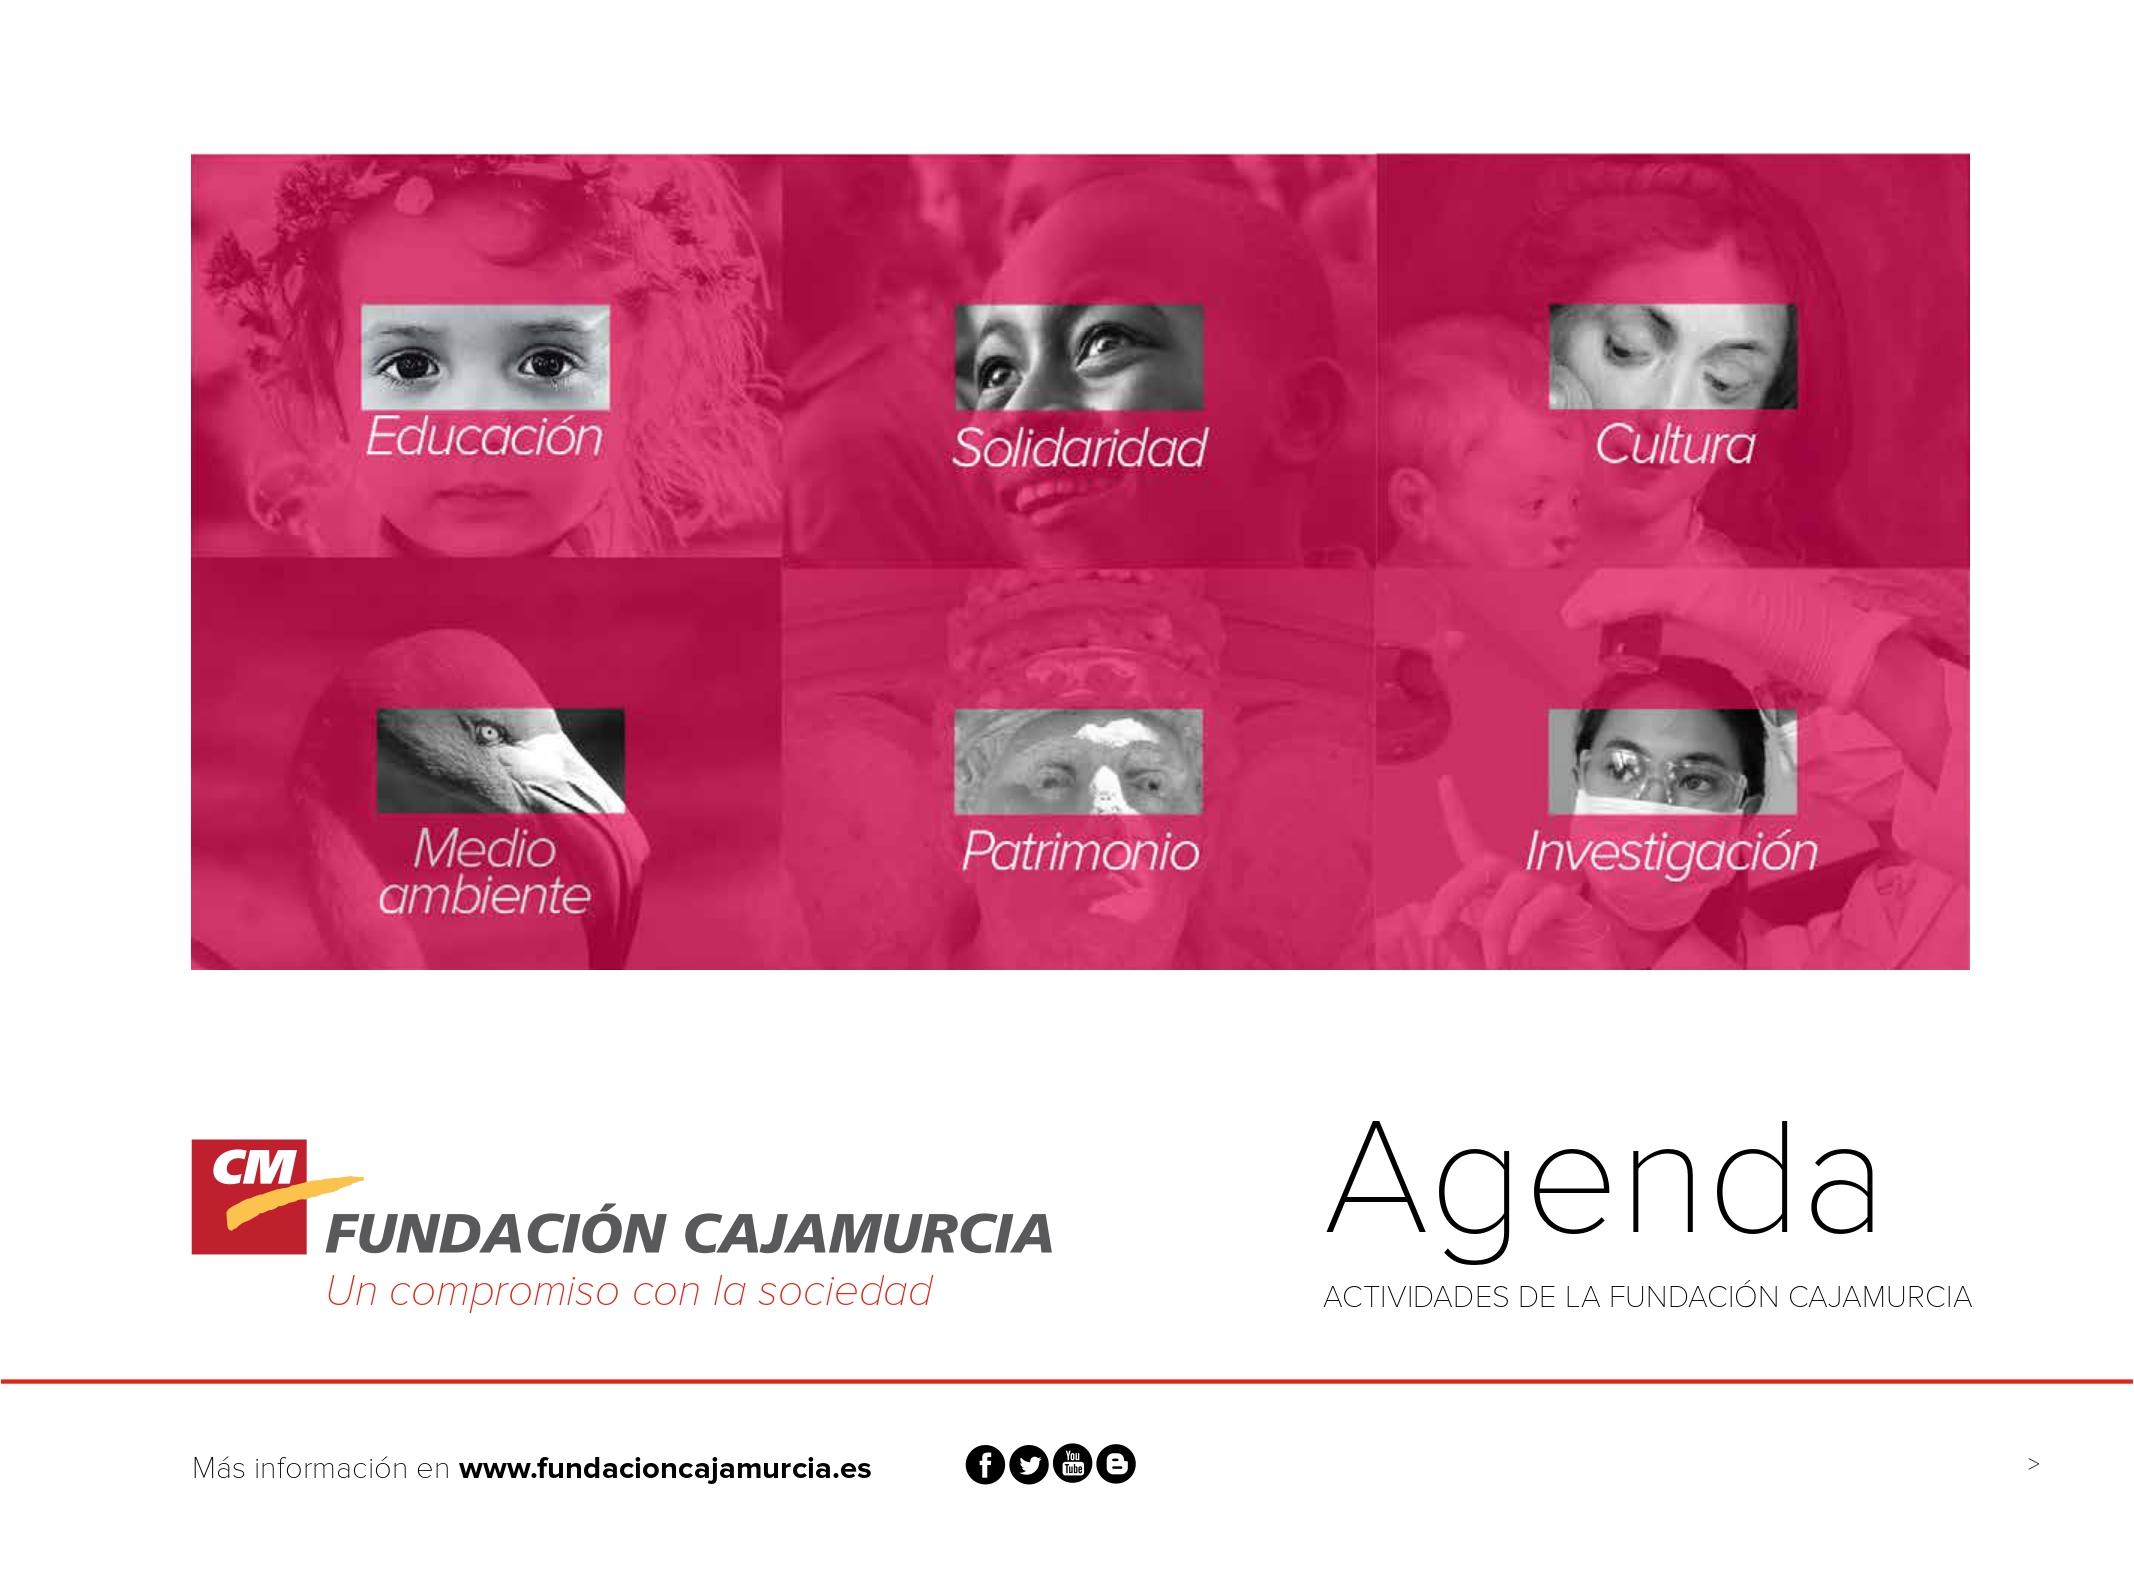 agenda-cajamurcia_page-0001.jpg